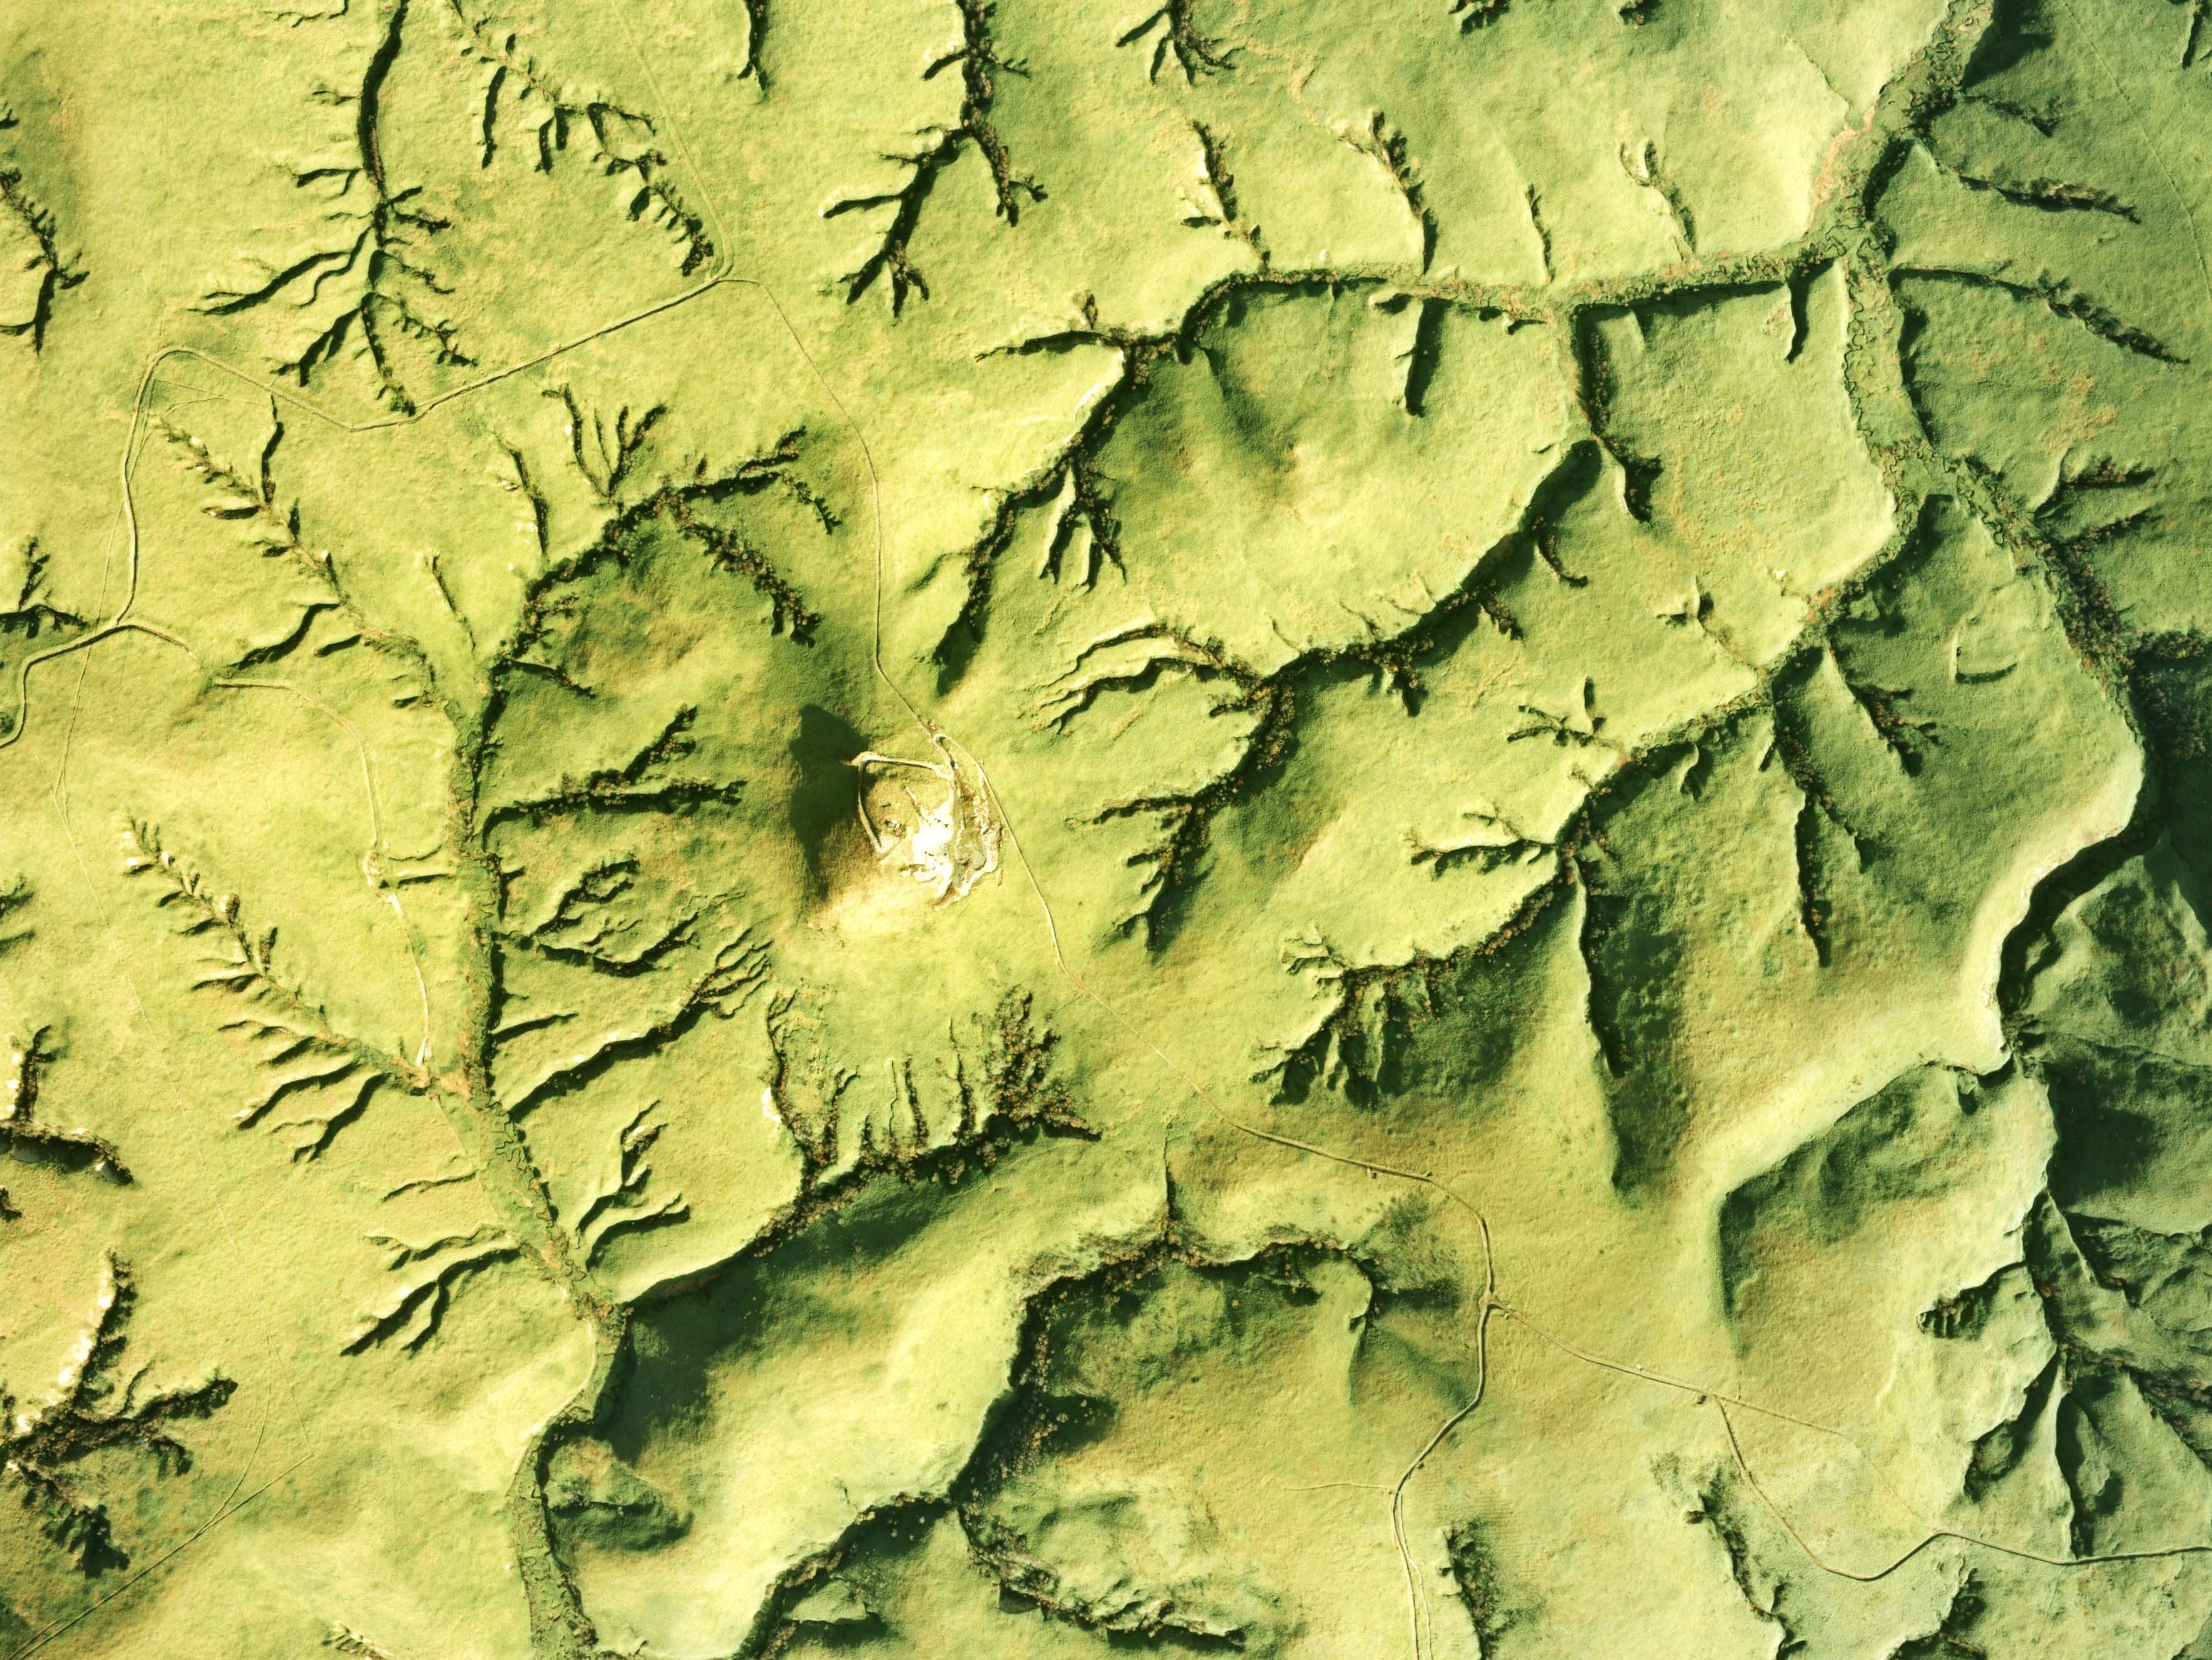 氷河地形 - Glacial landform